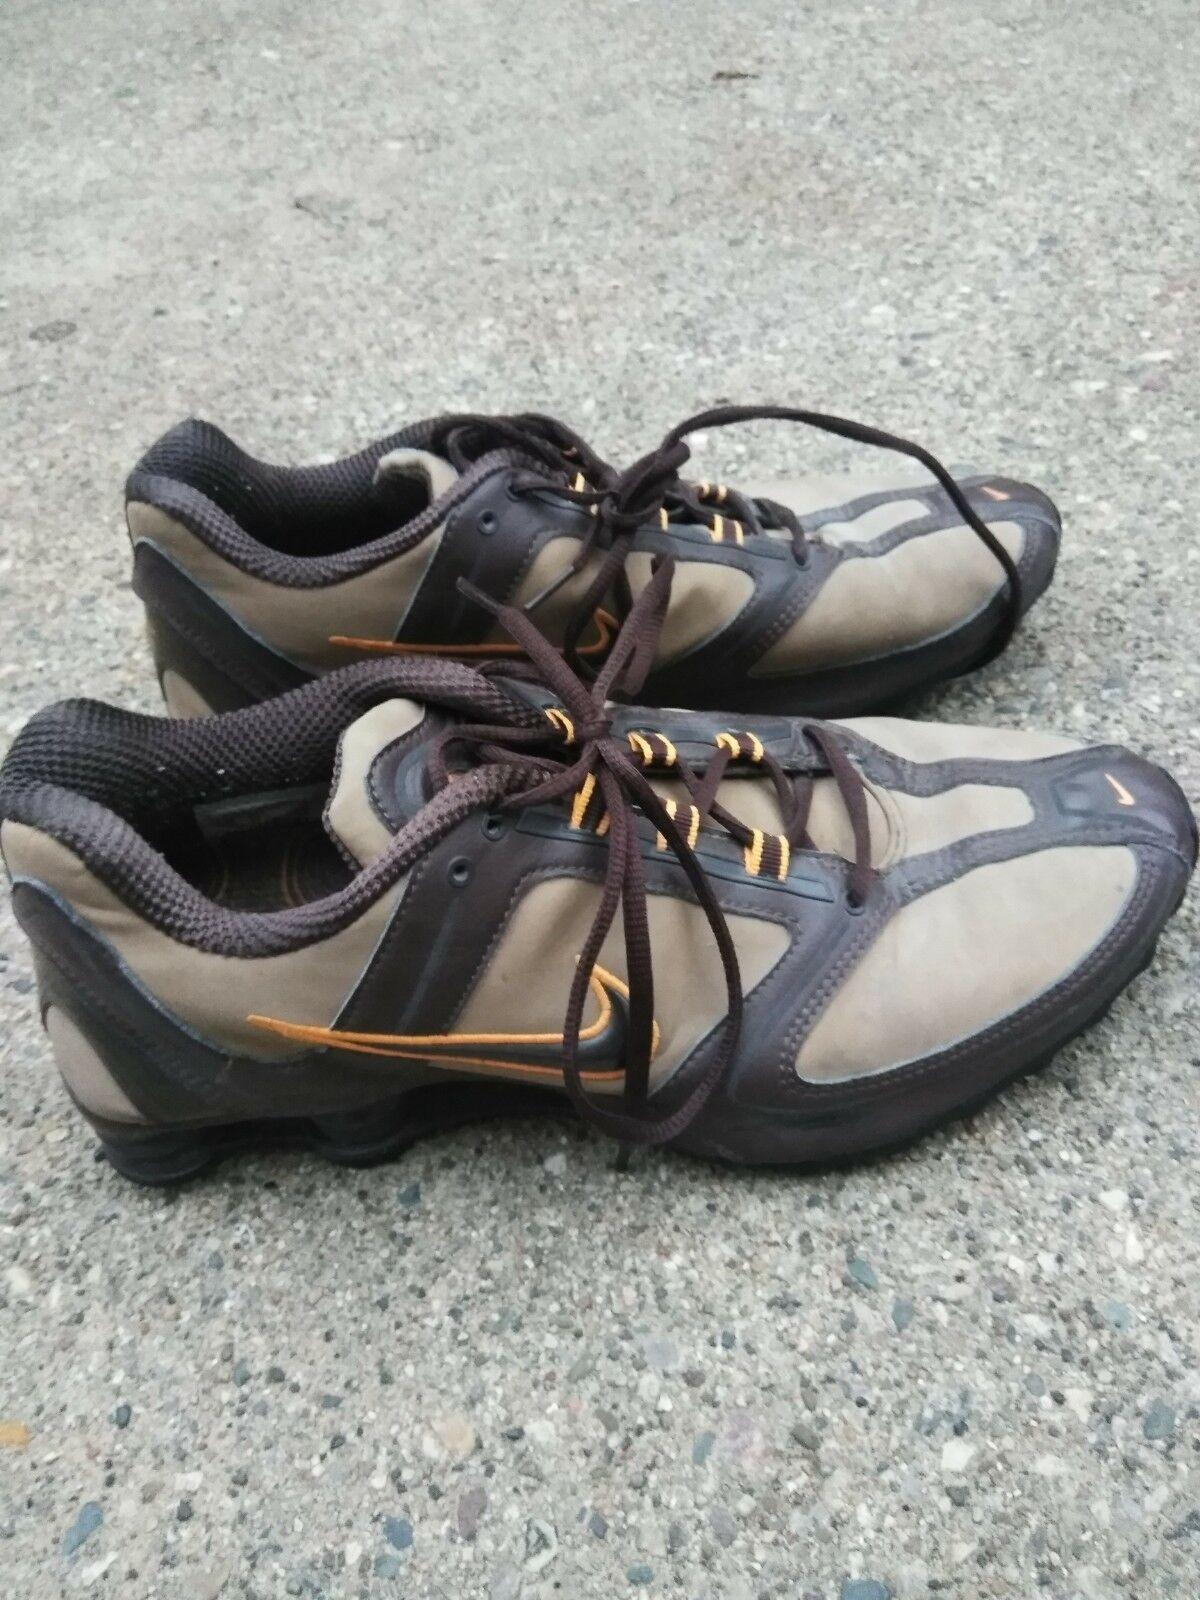 Mens nike shox shoes size 12